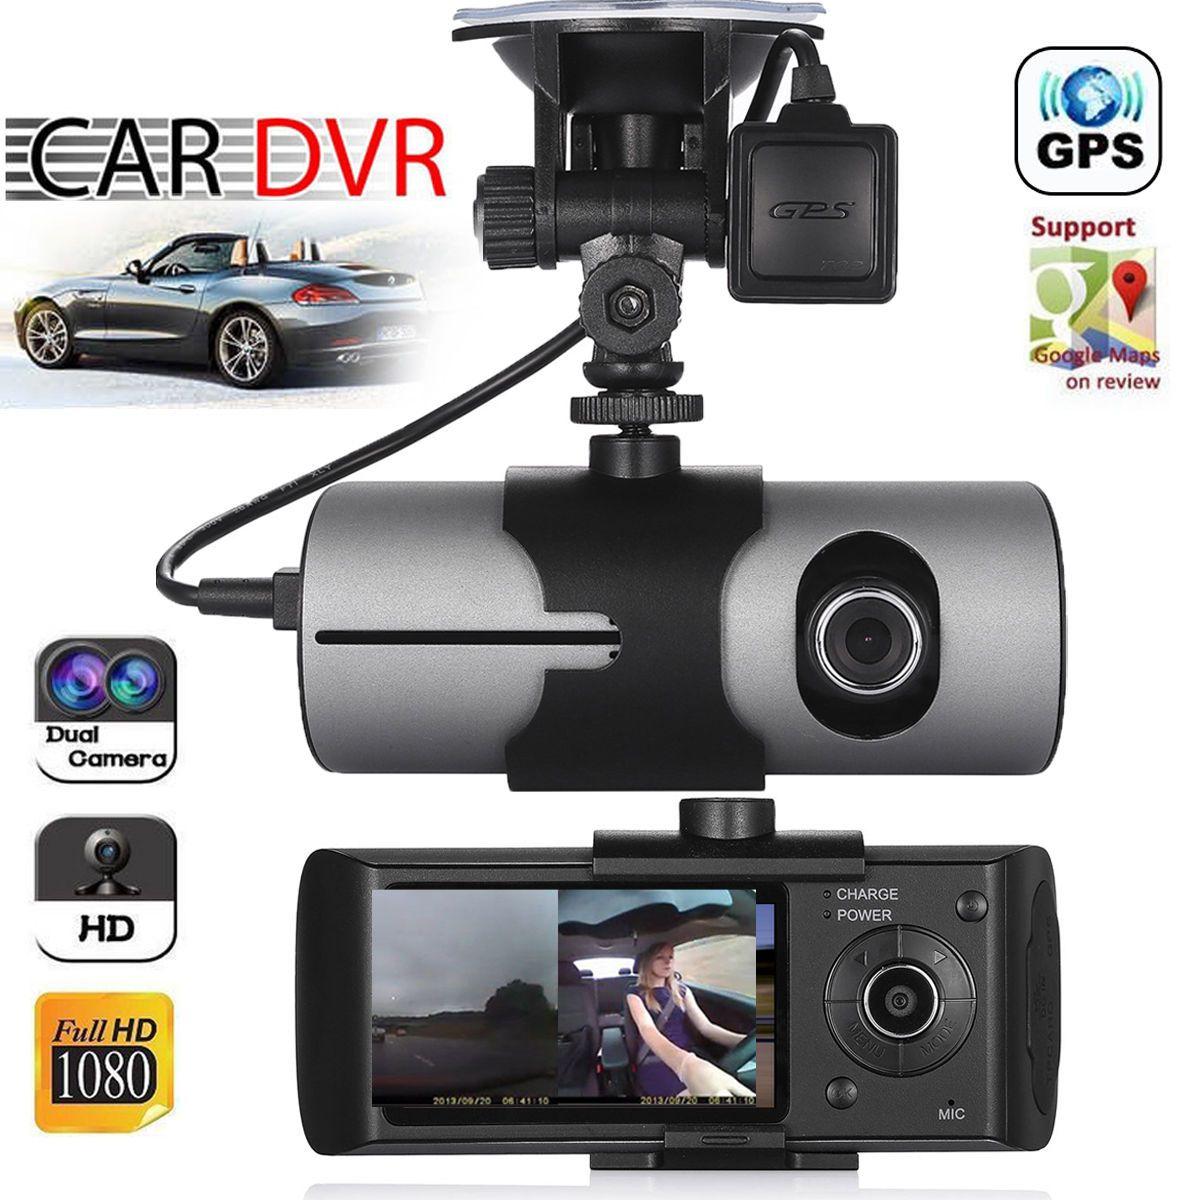 ... Camera HD Car DVR Dash Cam Video Recorder G Sensor Night Vision Car  Camera Video Car Camera Video Recorder From Fanyutrading company 72cd63d22